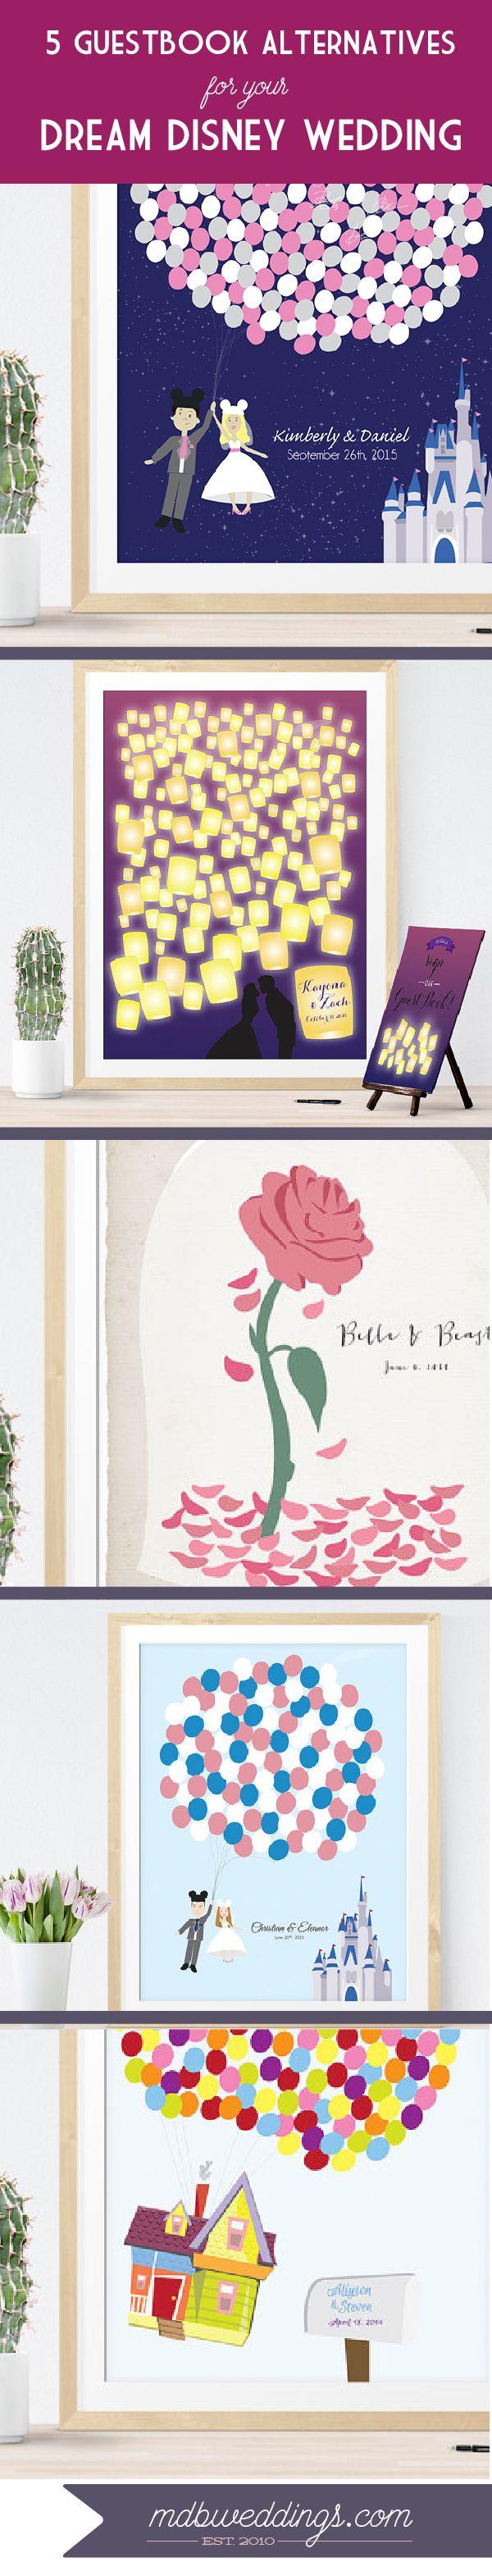 5 Guest Book Alternatives for your dream #disneywedding So Cute!!! Perfect #reception decor!